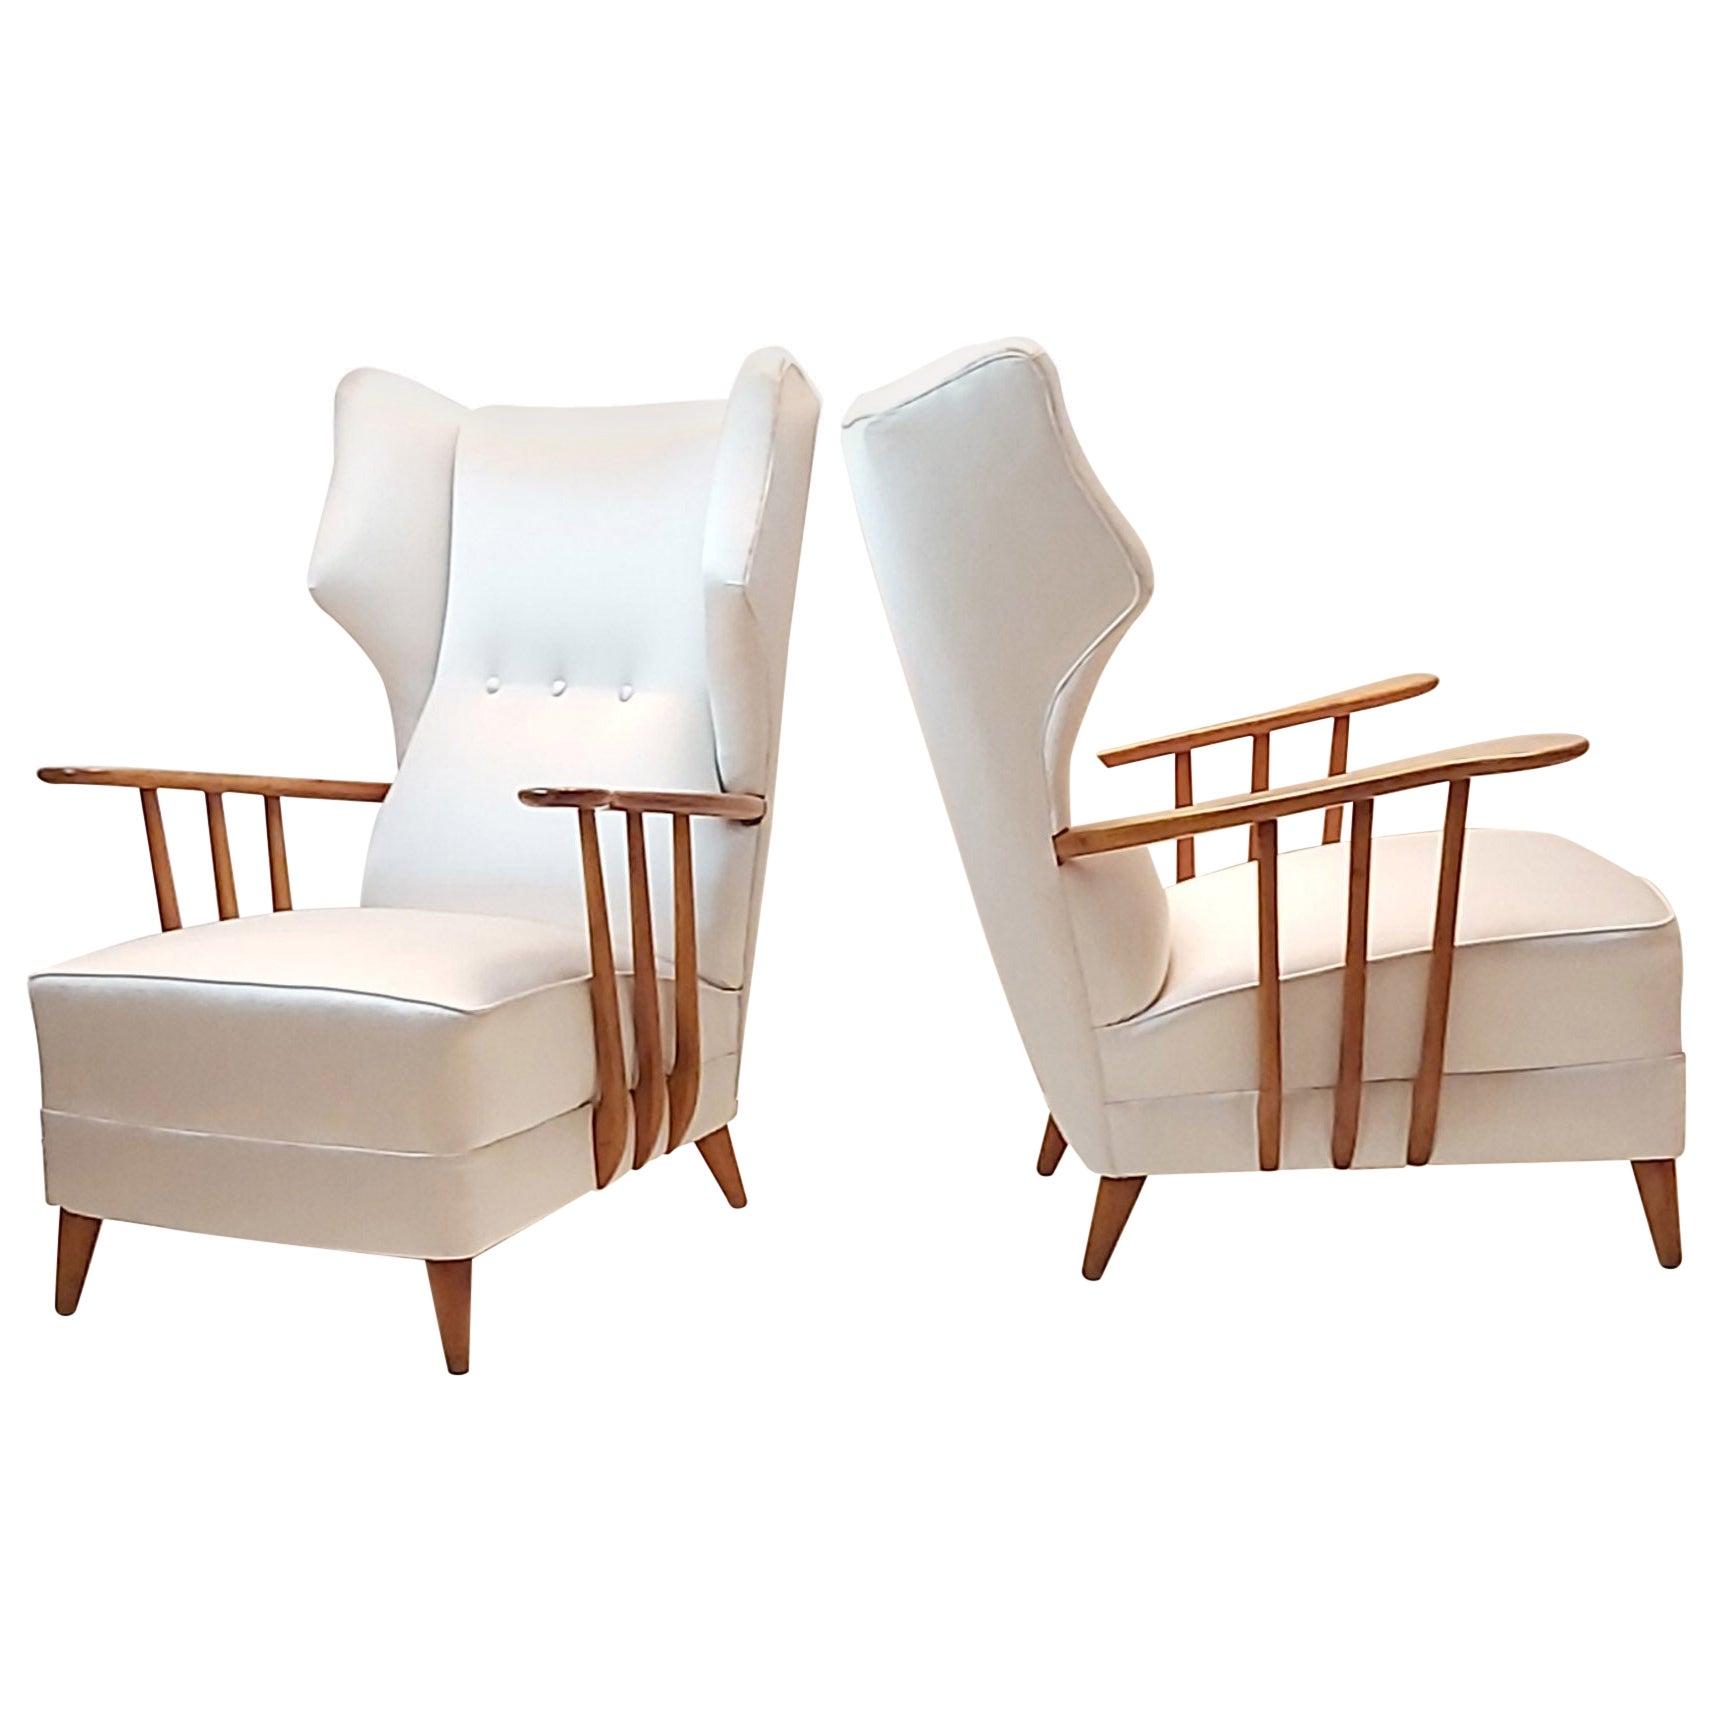 Mid-Century Modern pair of White Satin Ico Parisi Armchairs, Como, 1950s